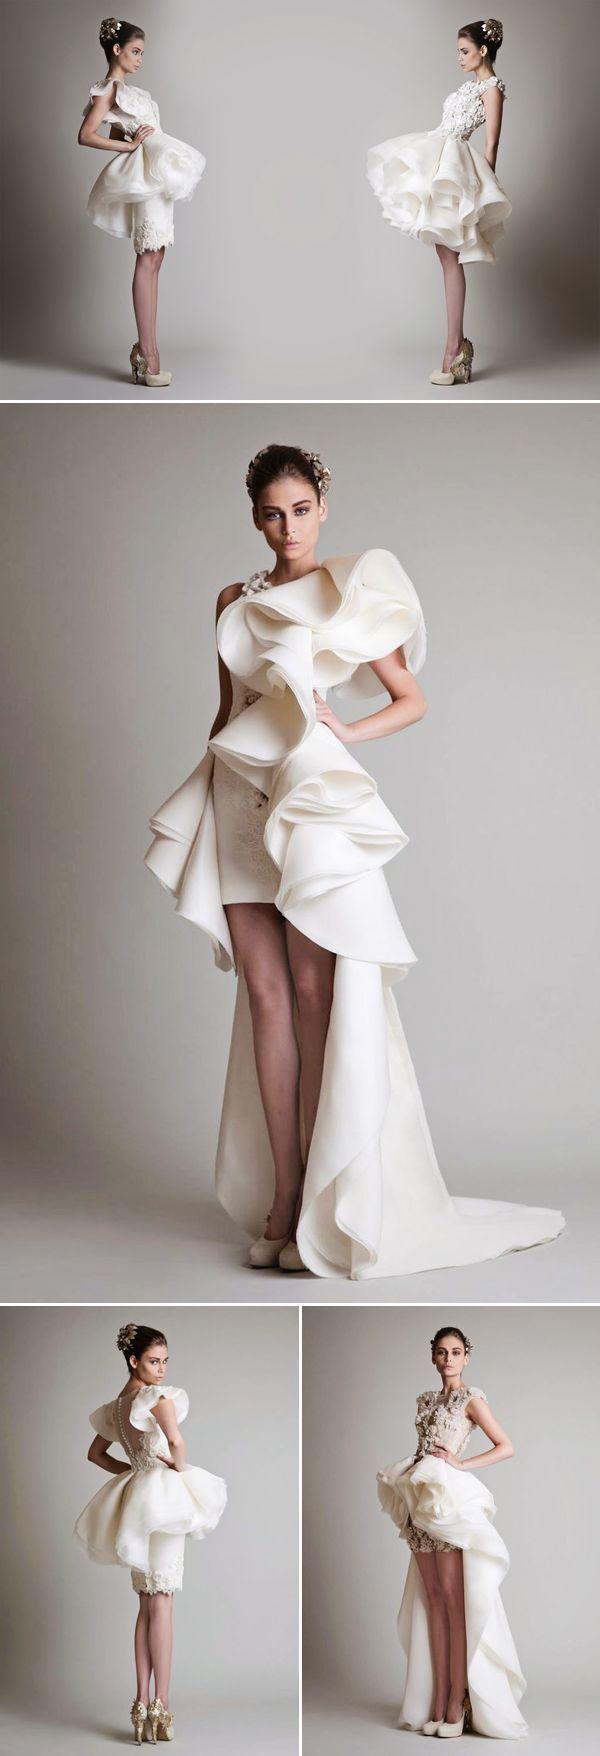 Cute short wedding dresses   best Dresses I Like images on Pinterest  Bridal gowns Cute